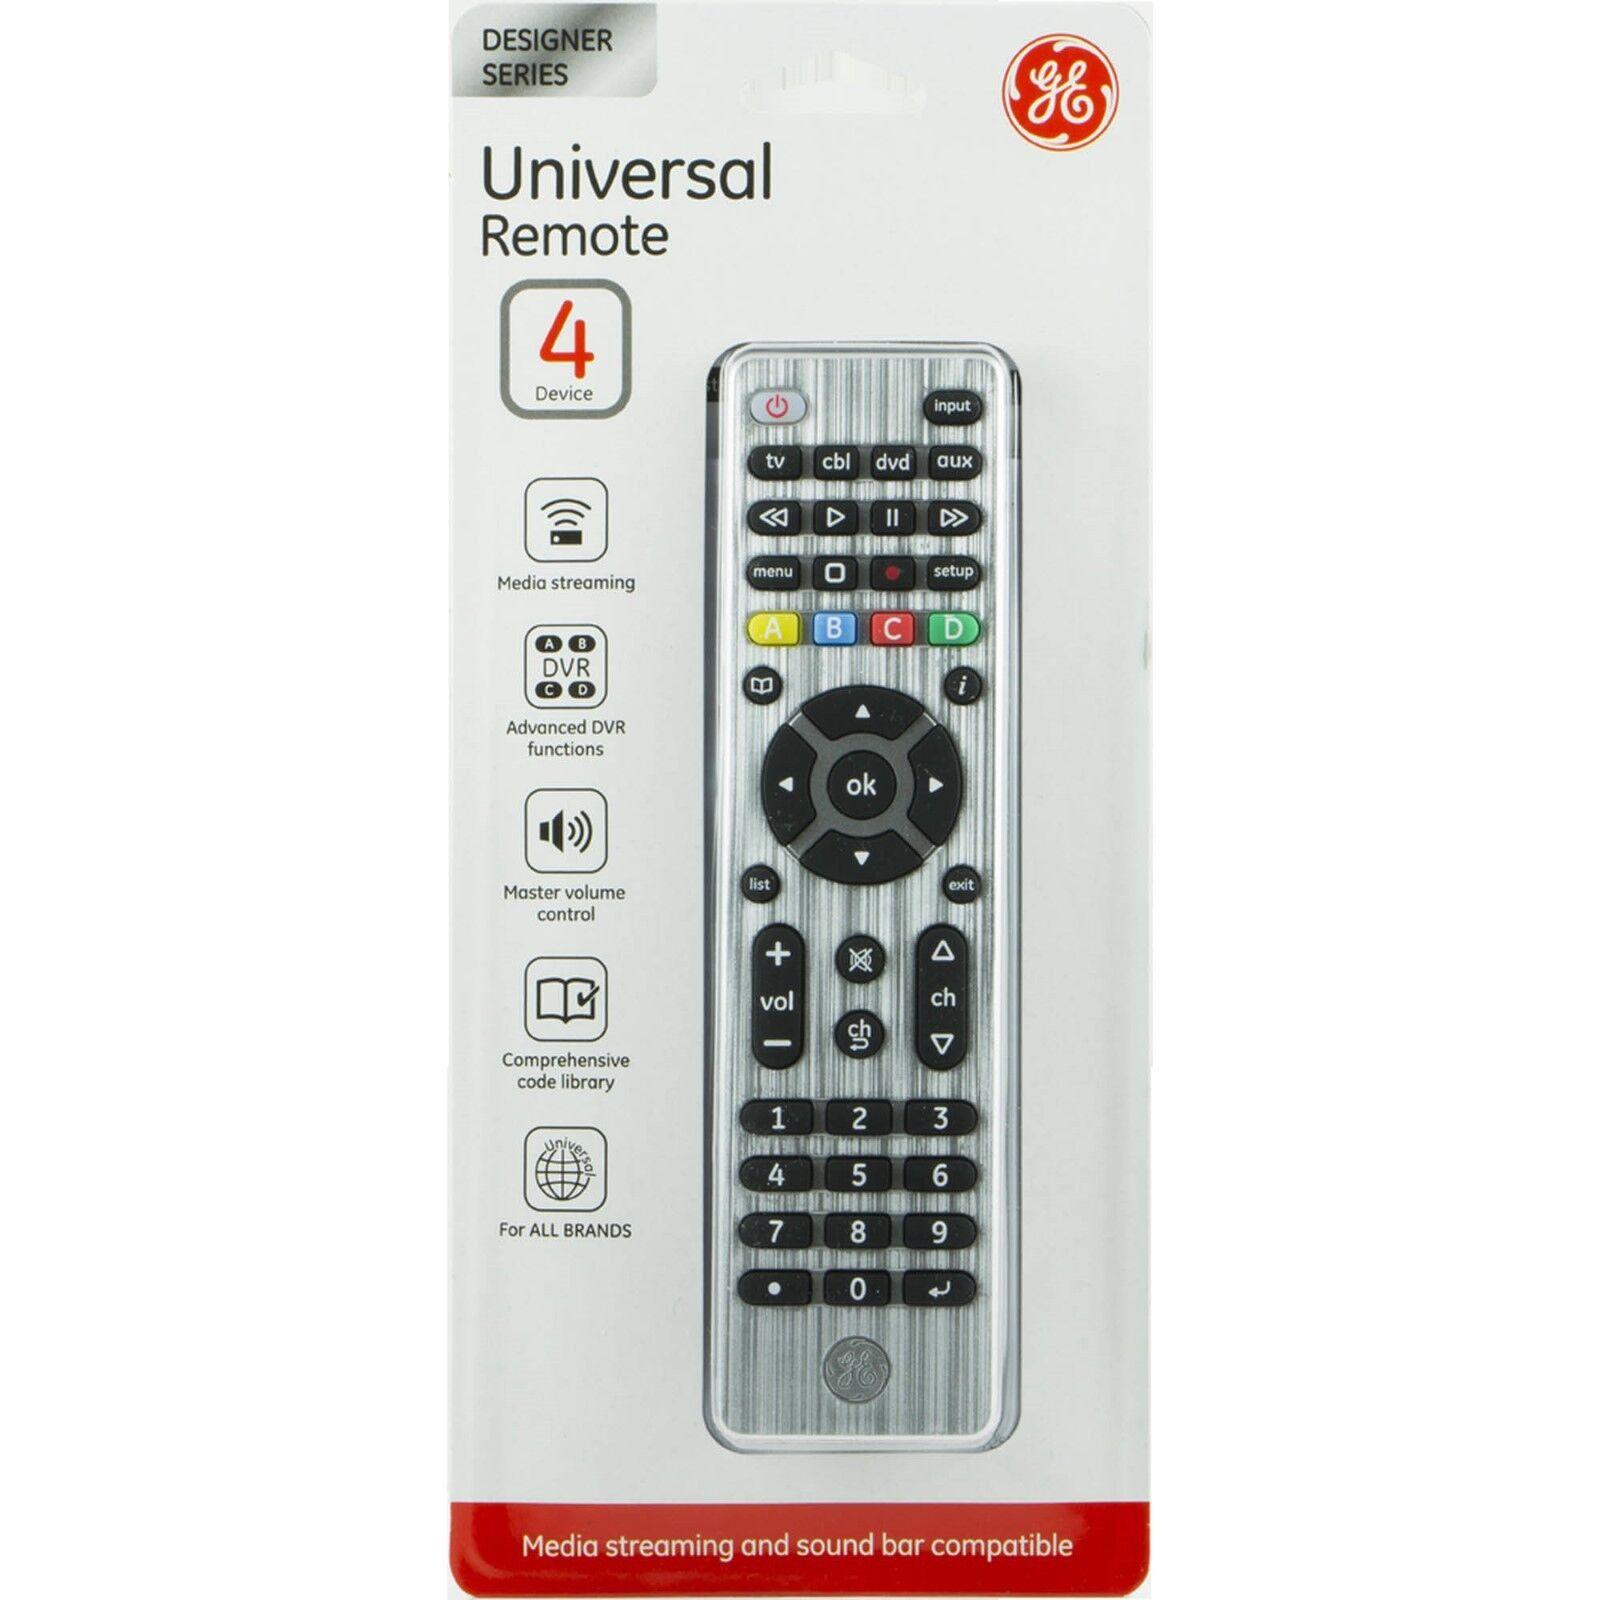 UNIVERSAL REMOTE 4 DEVICES MEDIA STREAMING&SOUND BAR COMPATI